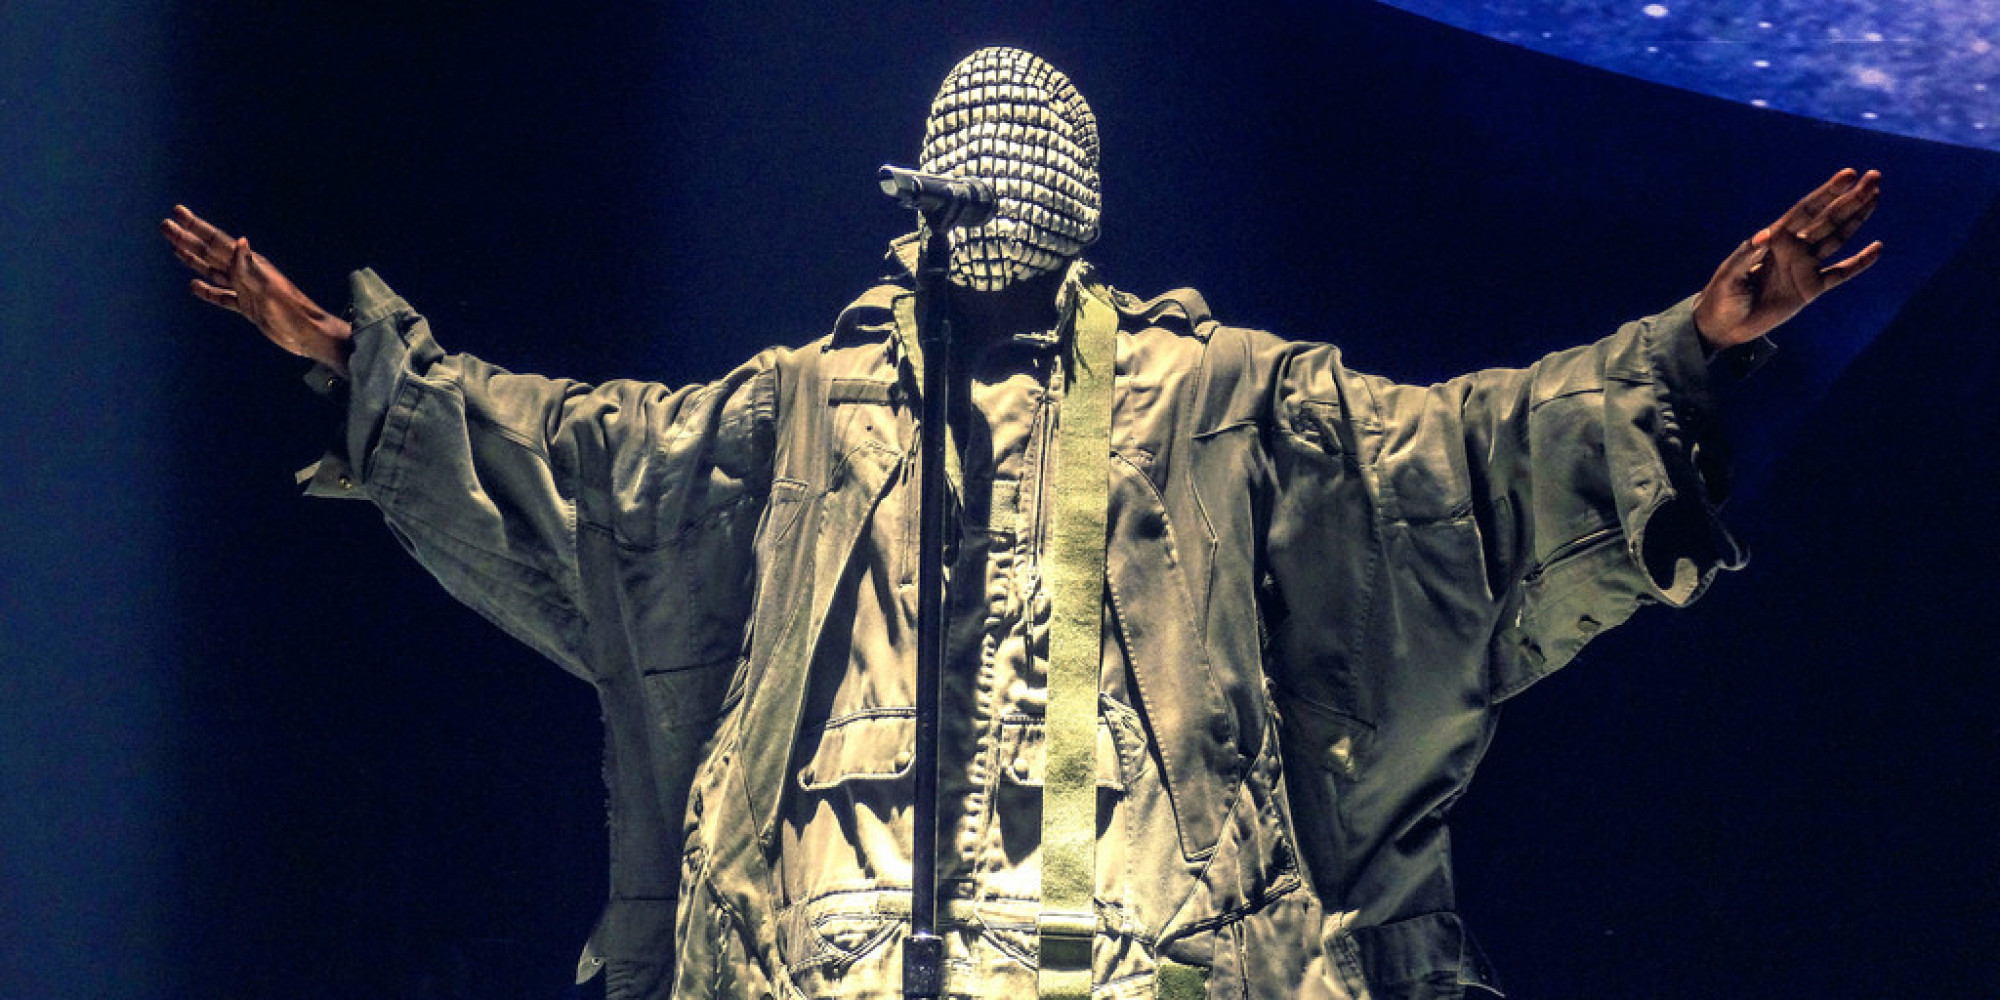 Kanye West At United Center: 'Yeezus' Tour Comes To ... Kanye West Yeezus Concert